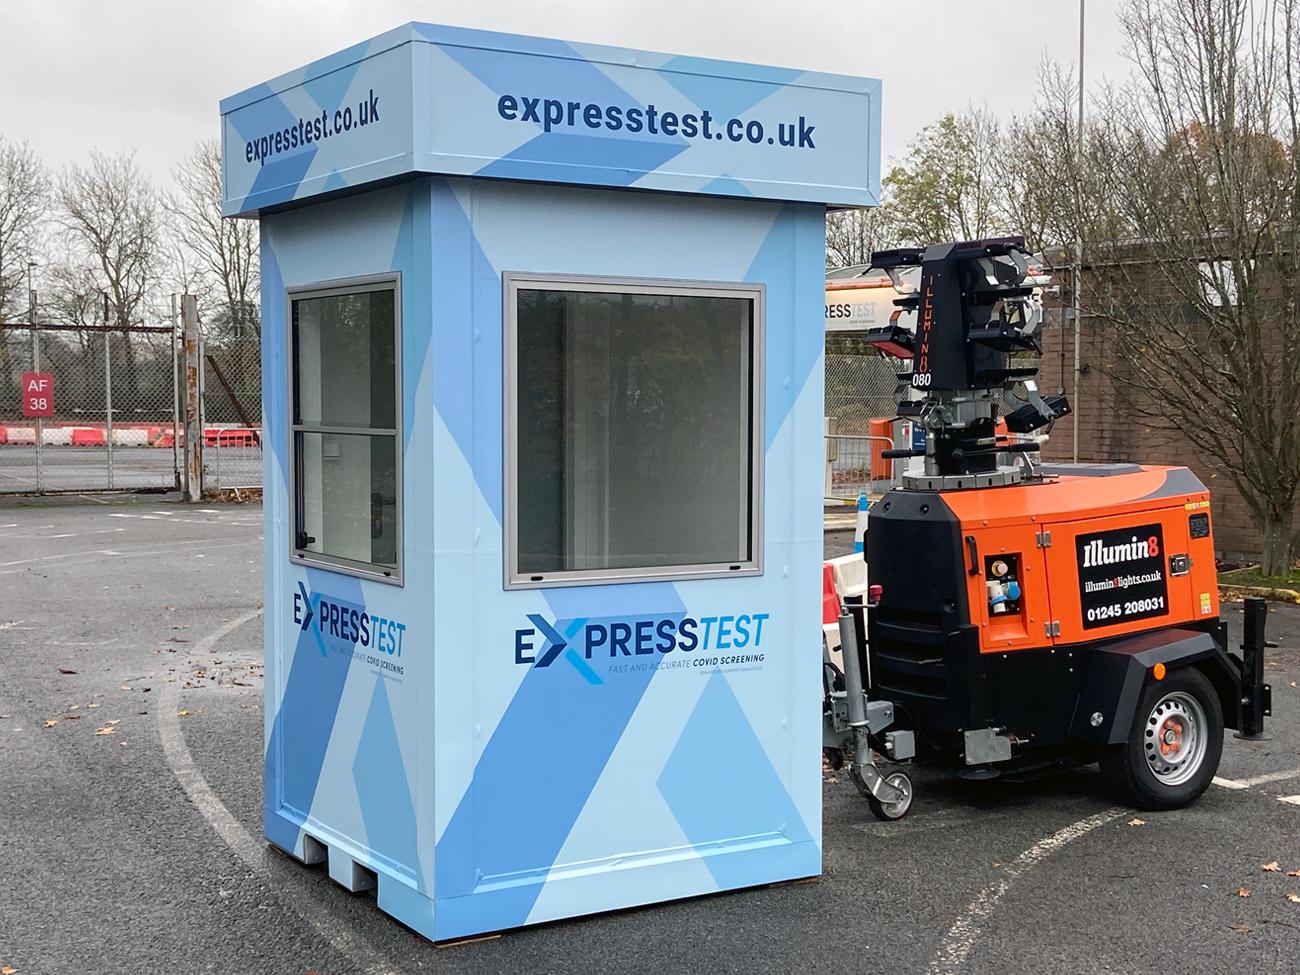 Covid-19 Express Test Gatwick Kiosk